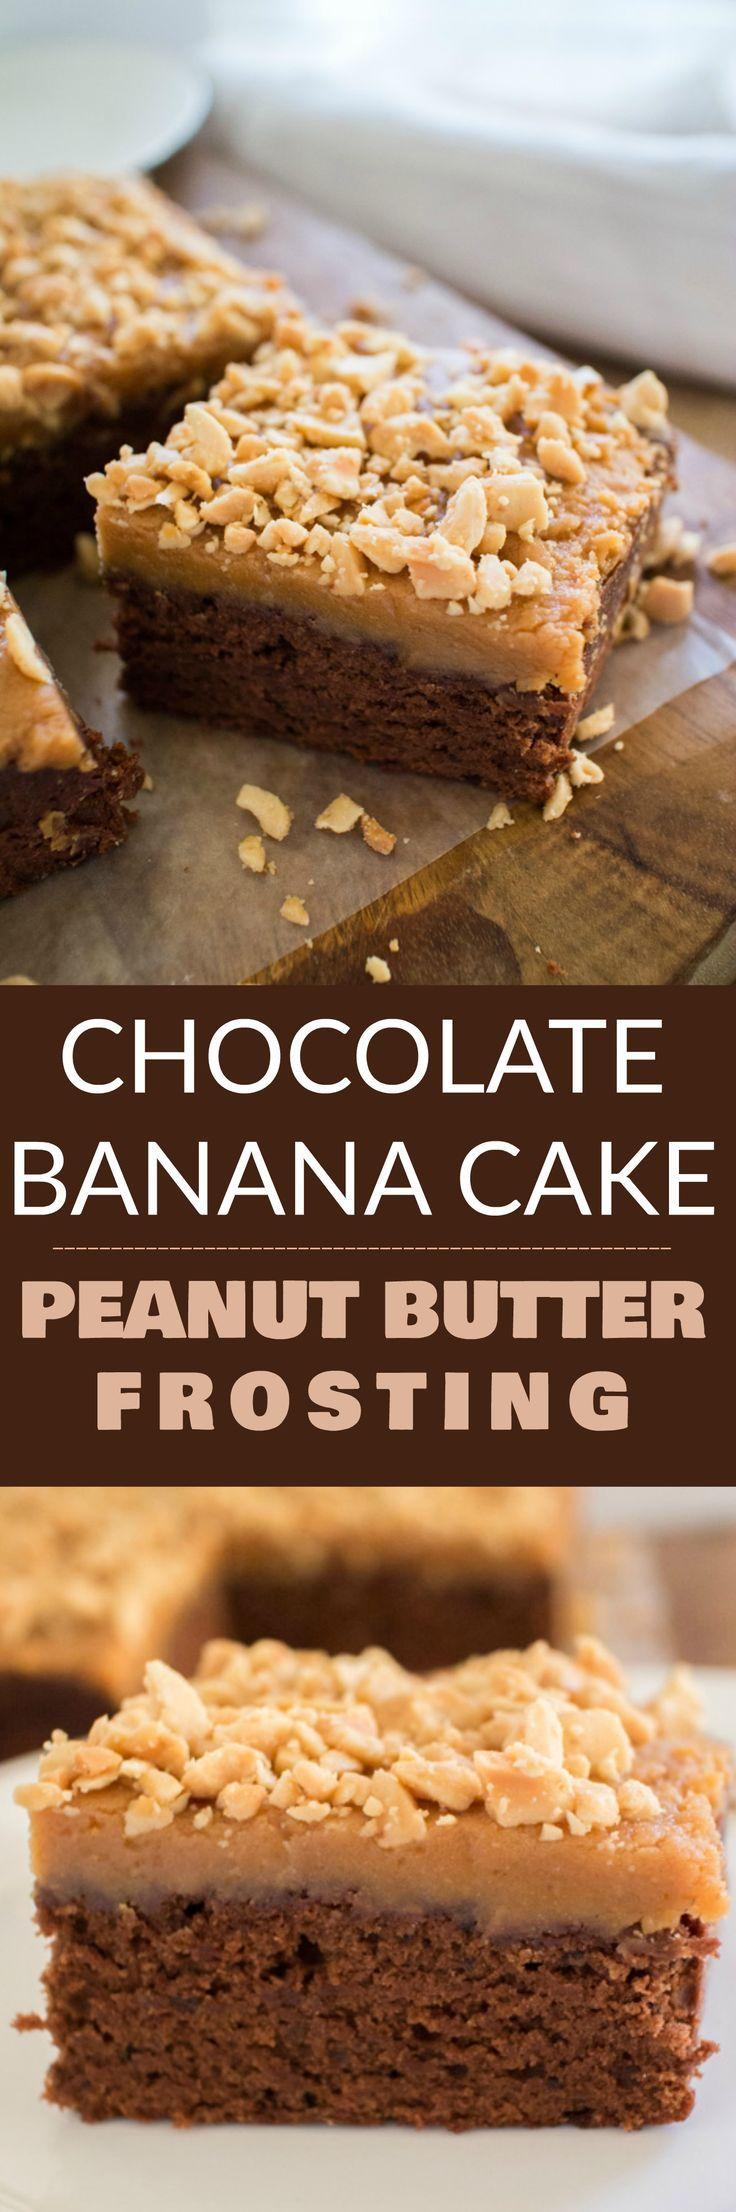 Easy Chocolate Cake Recipe 8x8